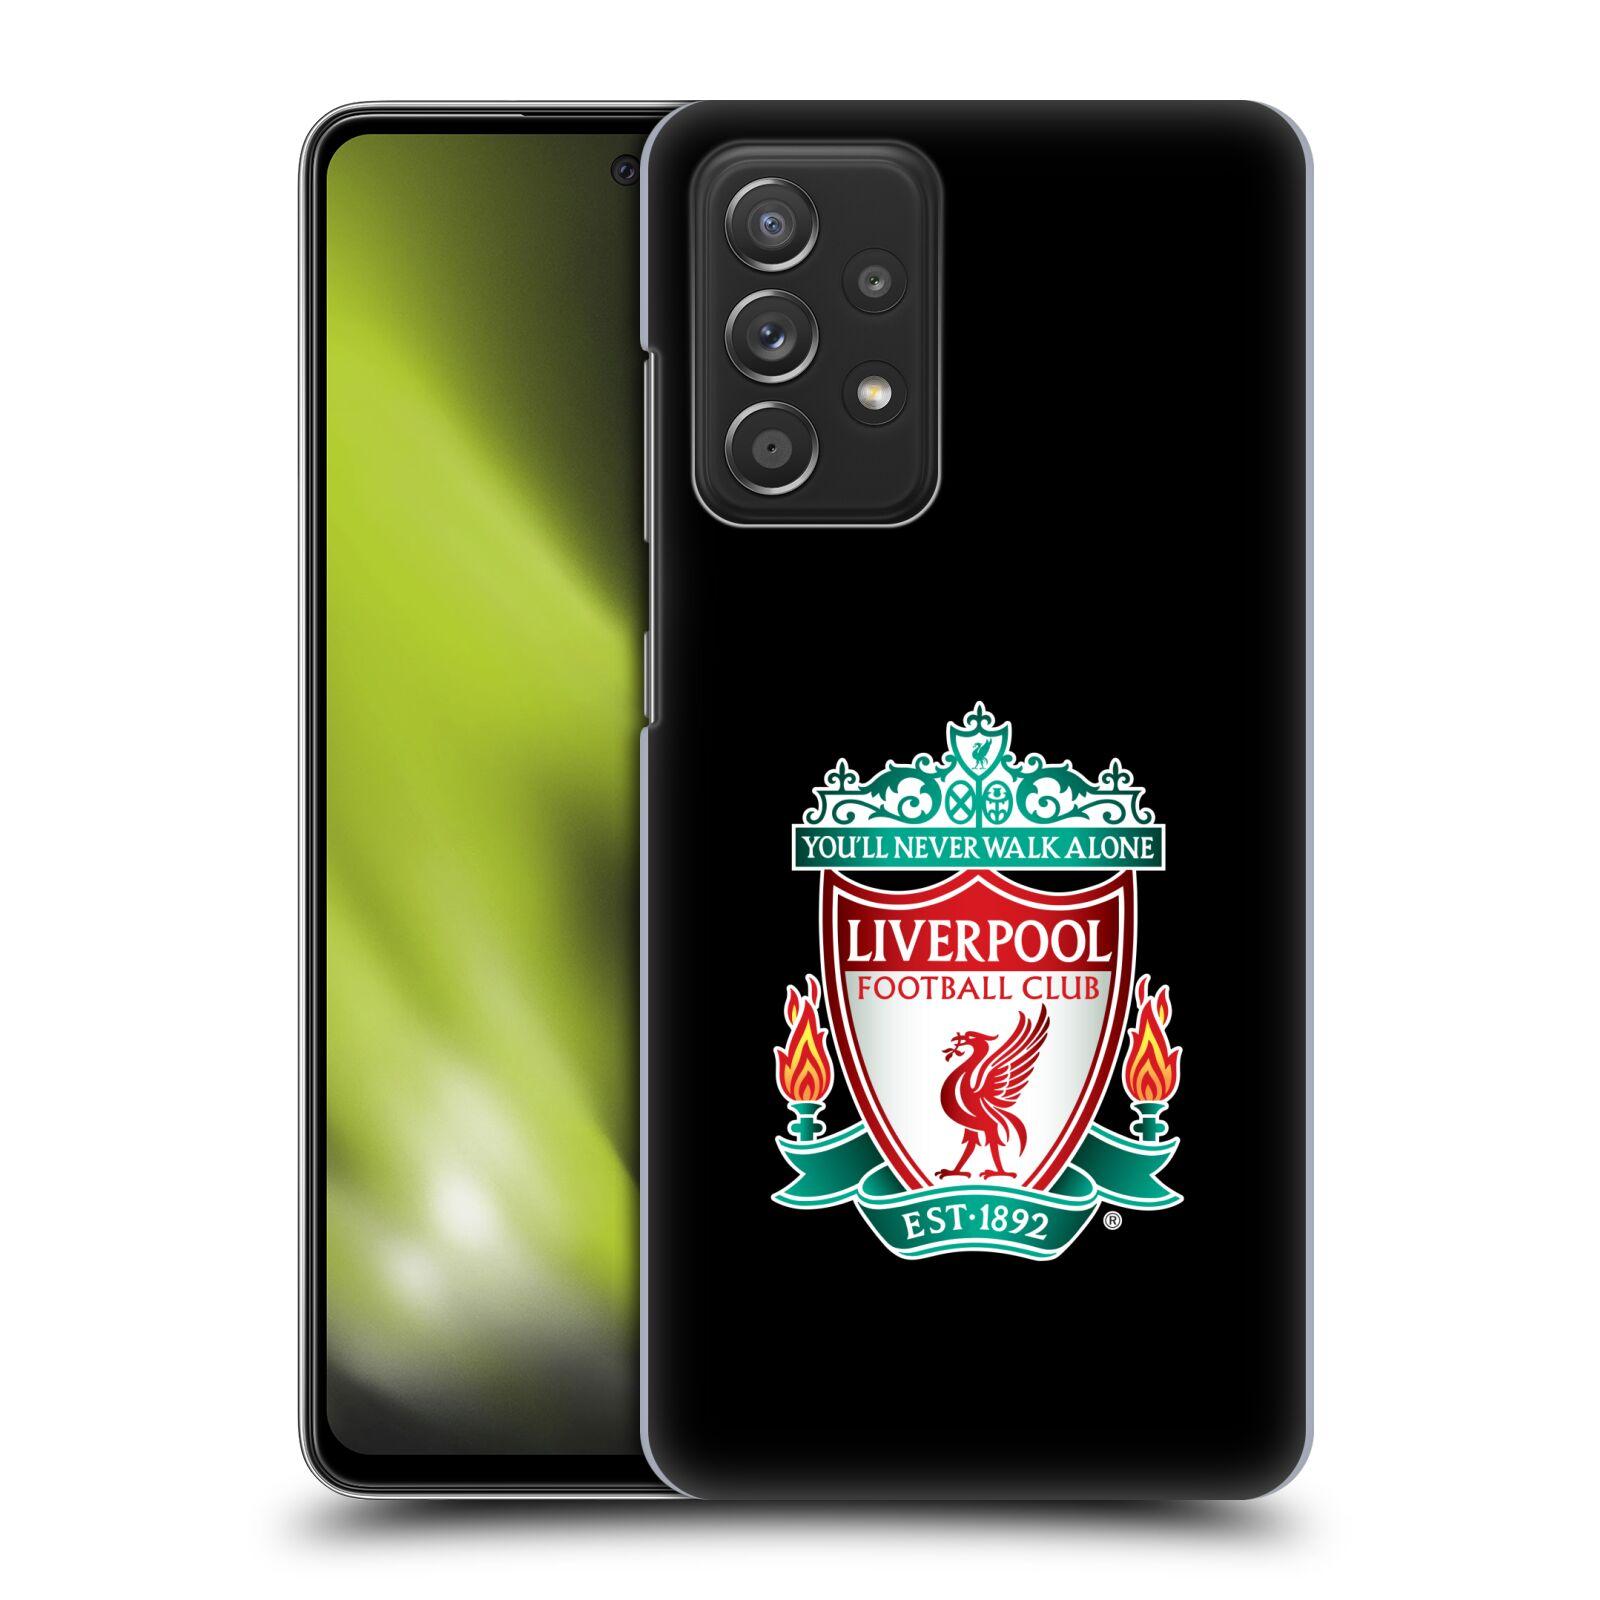 Plastové pouzdro na mobil Samsung Galaxy A52 / A52 5G / A52s 5G - Head Case - ZNAK LIVERPOOL FC OFFICIAL BLACK